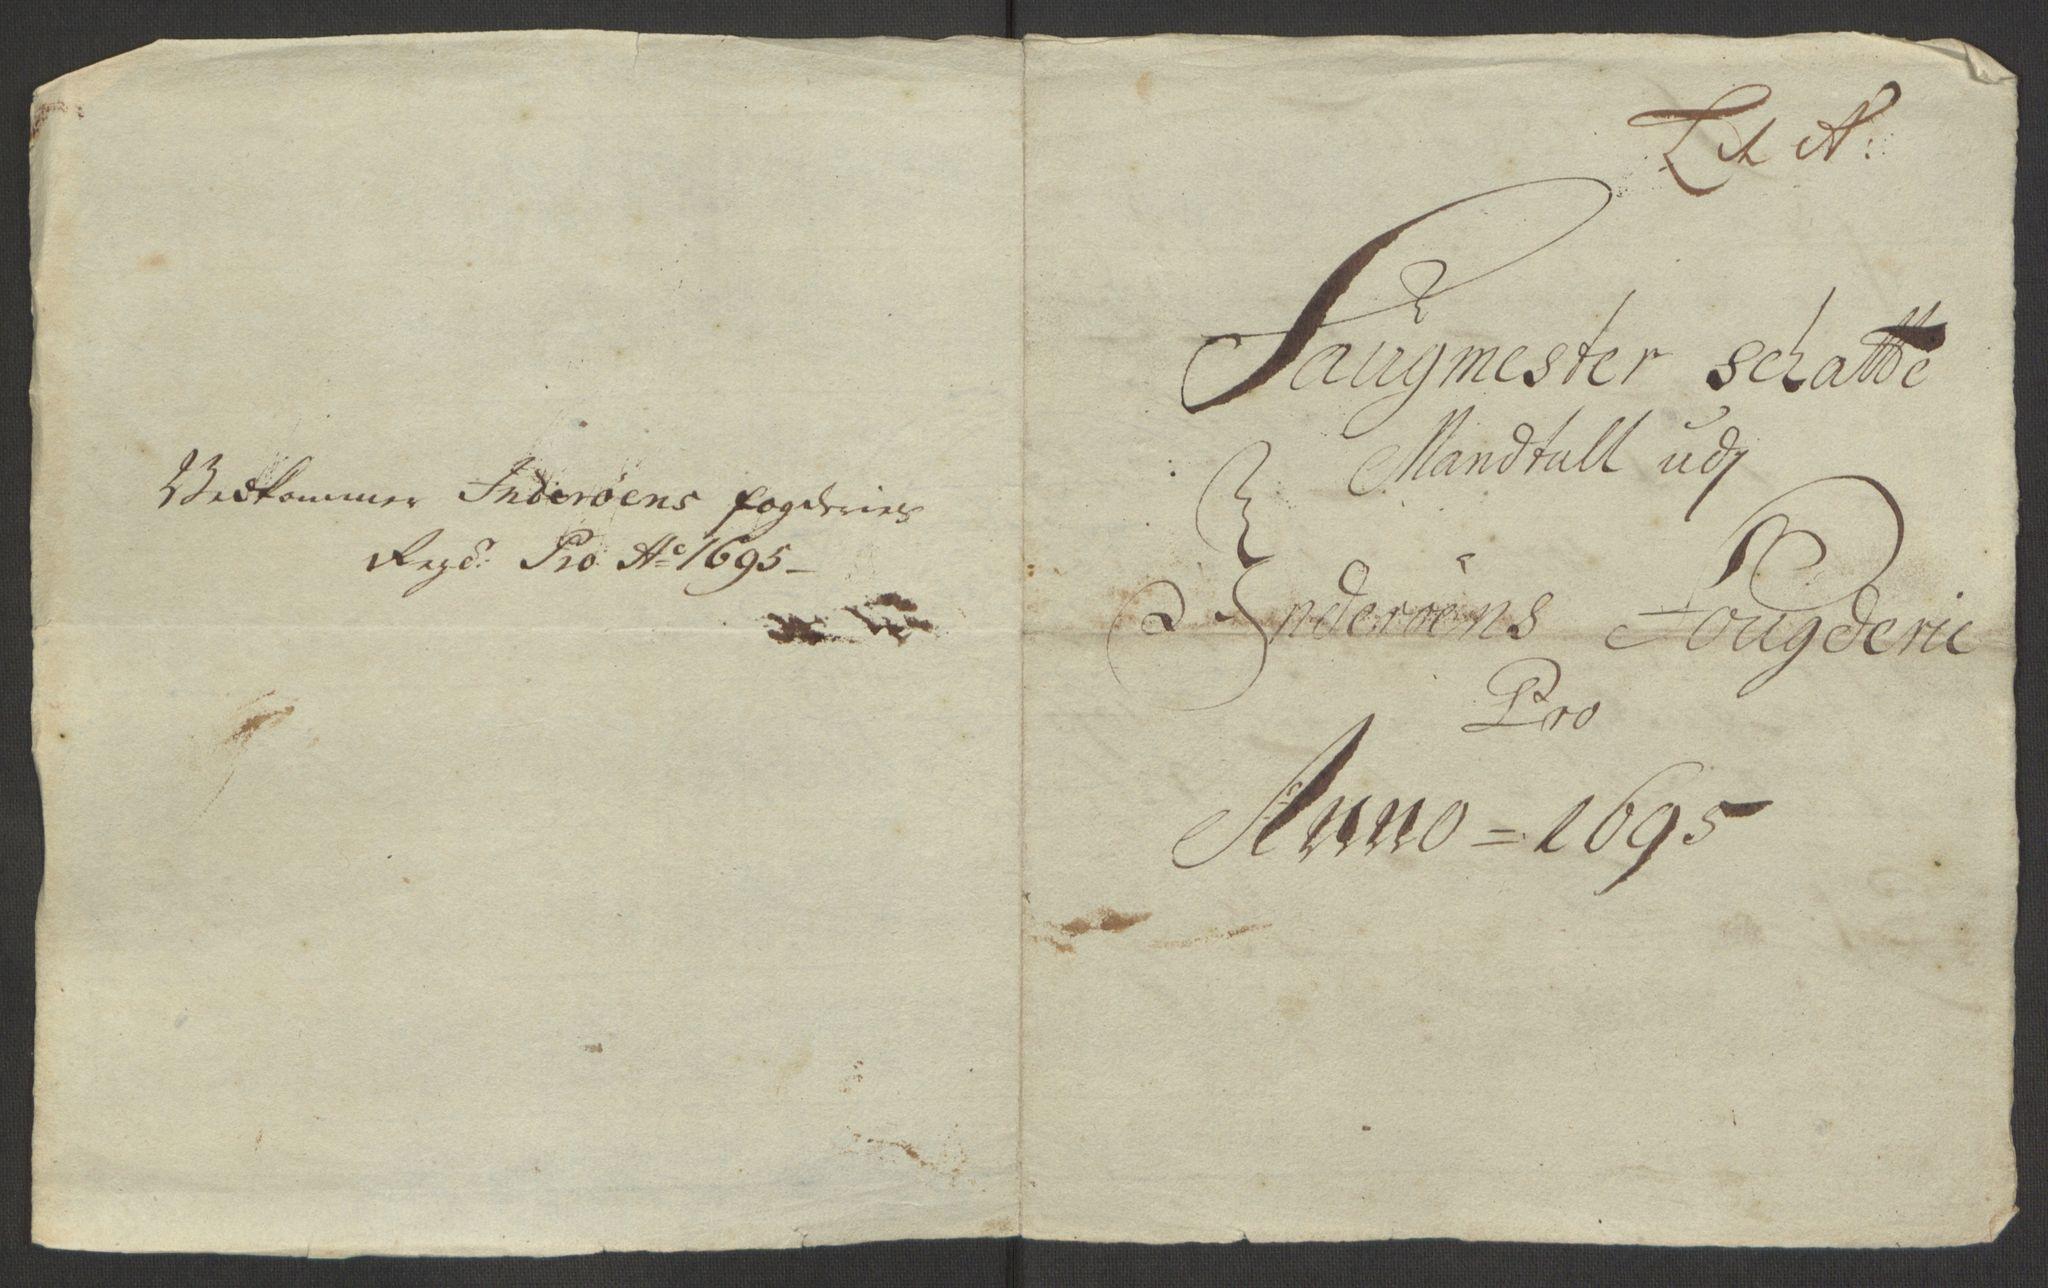 RA, Rentekammeret inntil 1814, Reviderte regnskaper, Fogderegnskap, R63/L4309: Fogderegnskap Inderøy, 1695-1697, s. 17